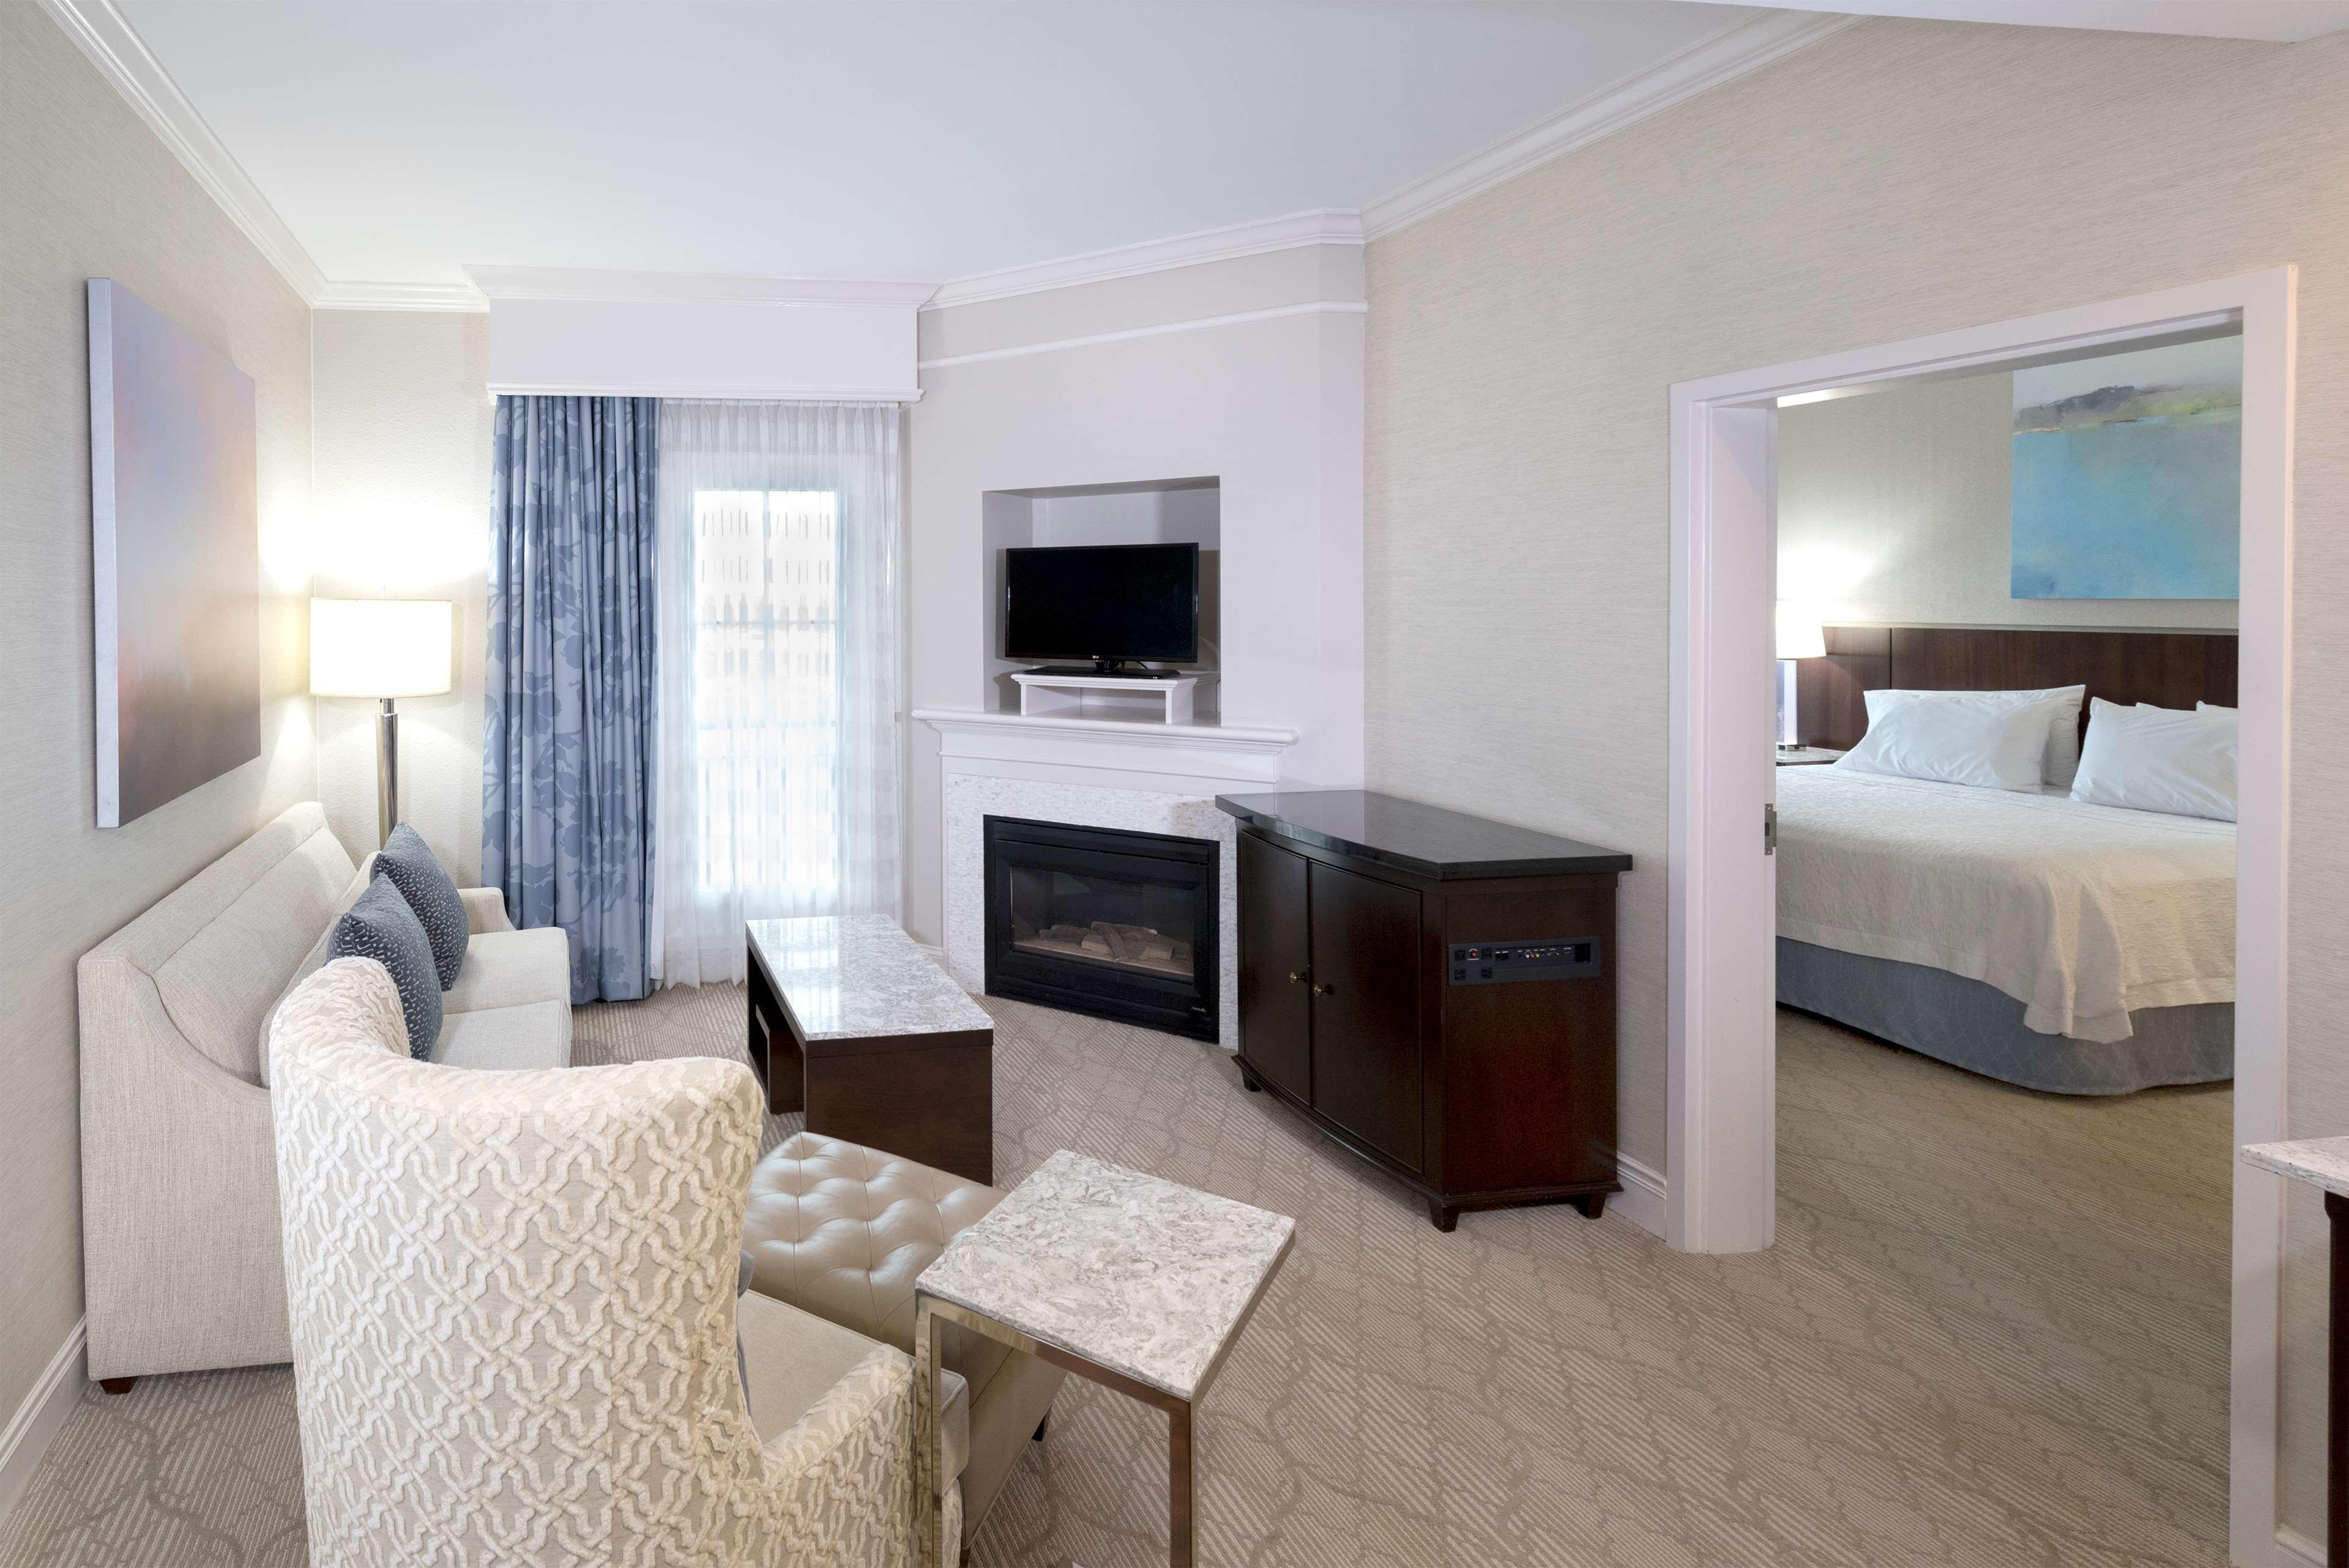 Hampton Inn & Suites Charlotte/South Park at Phillips Place image 21